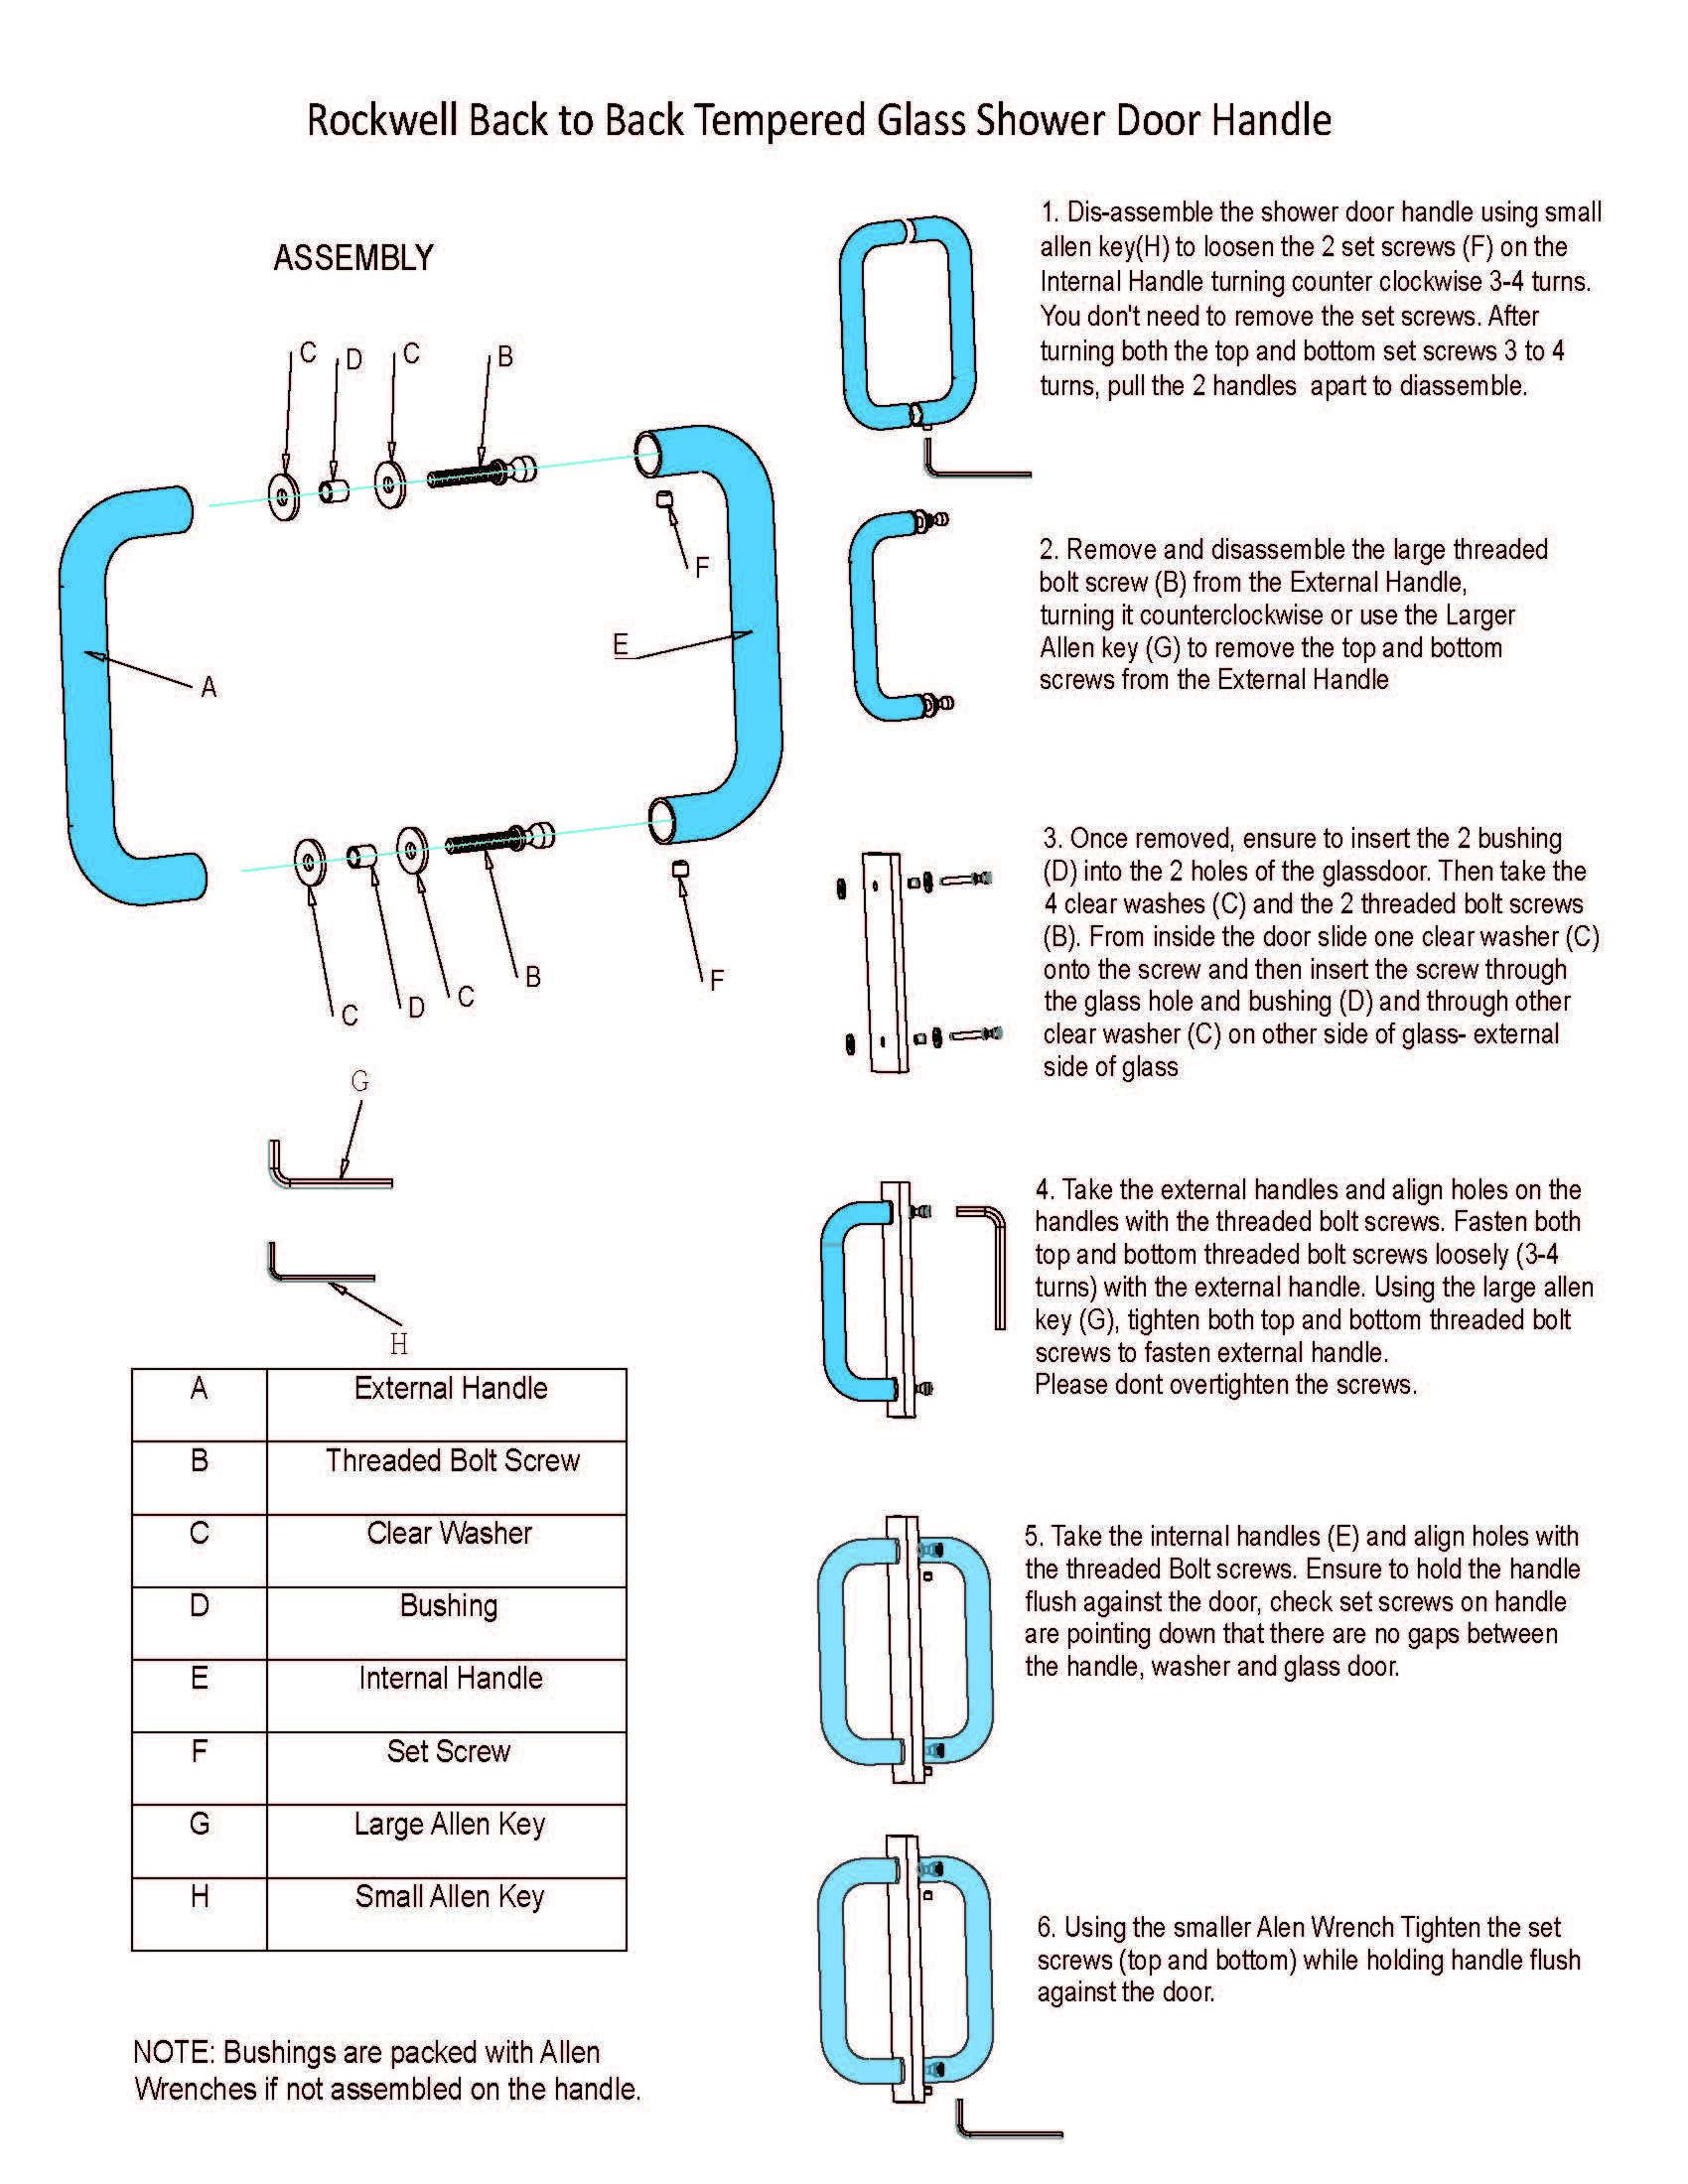 Mont Hard 8inch; Back to Back Tubular Pull in Brushed Nickel Finish for Heavy Glass Frameless Shower Doors